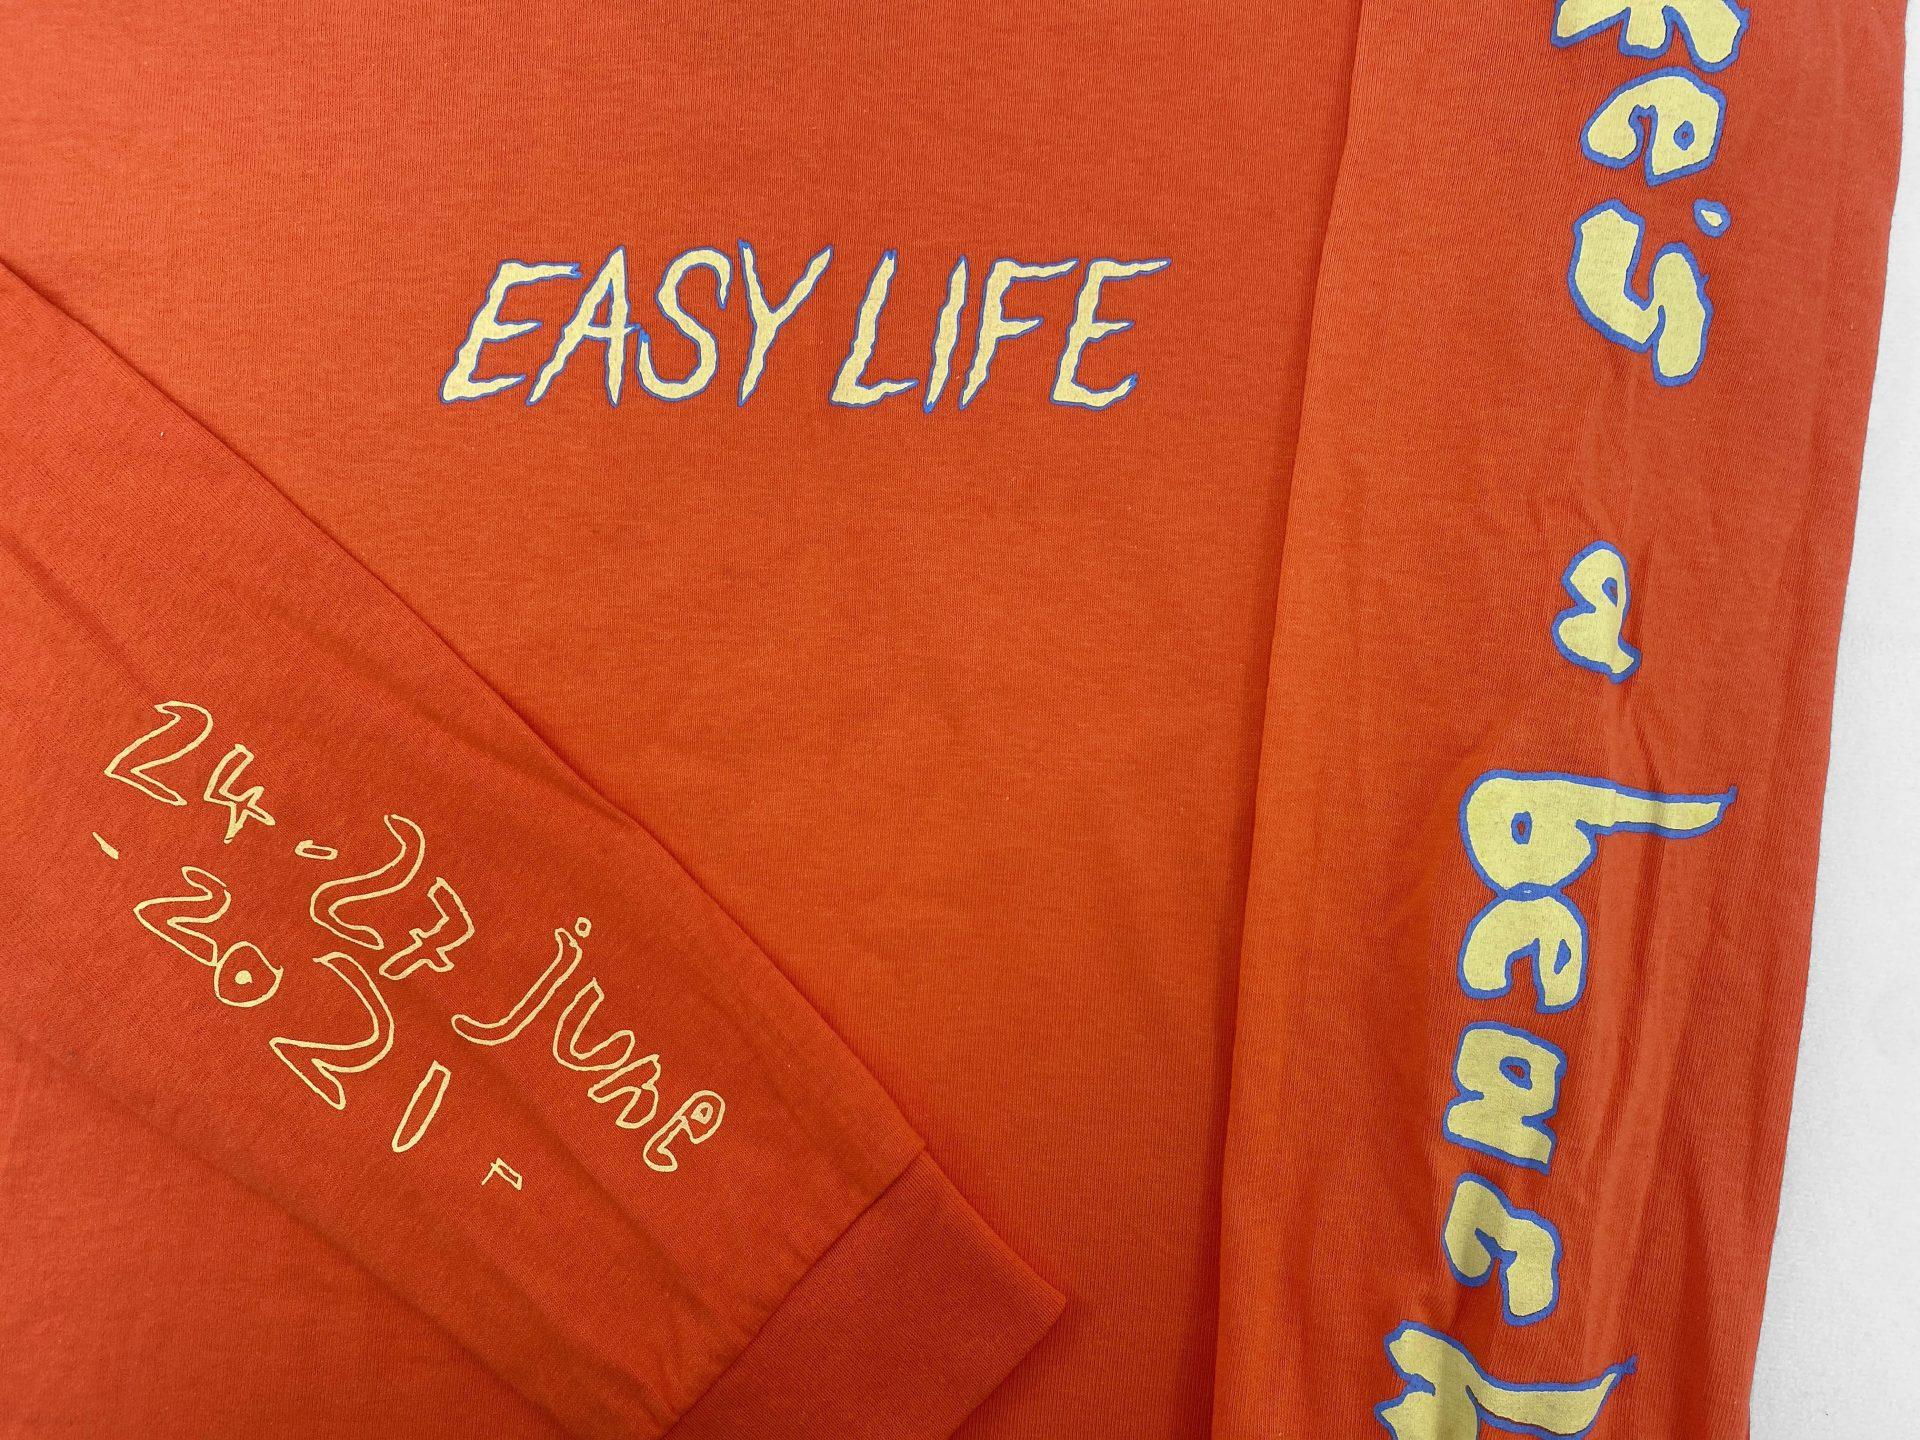 Orange Easy Life screen printed back using water based inks